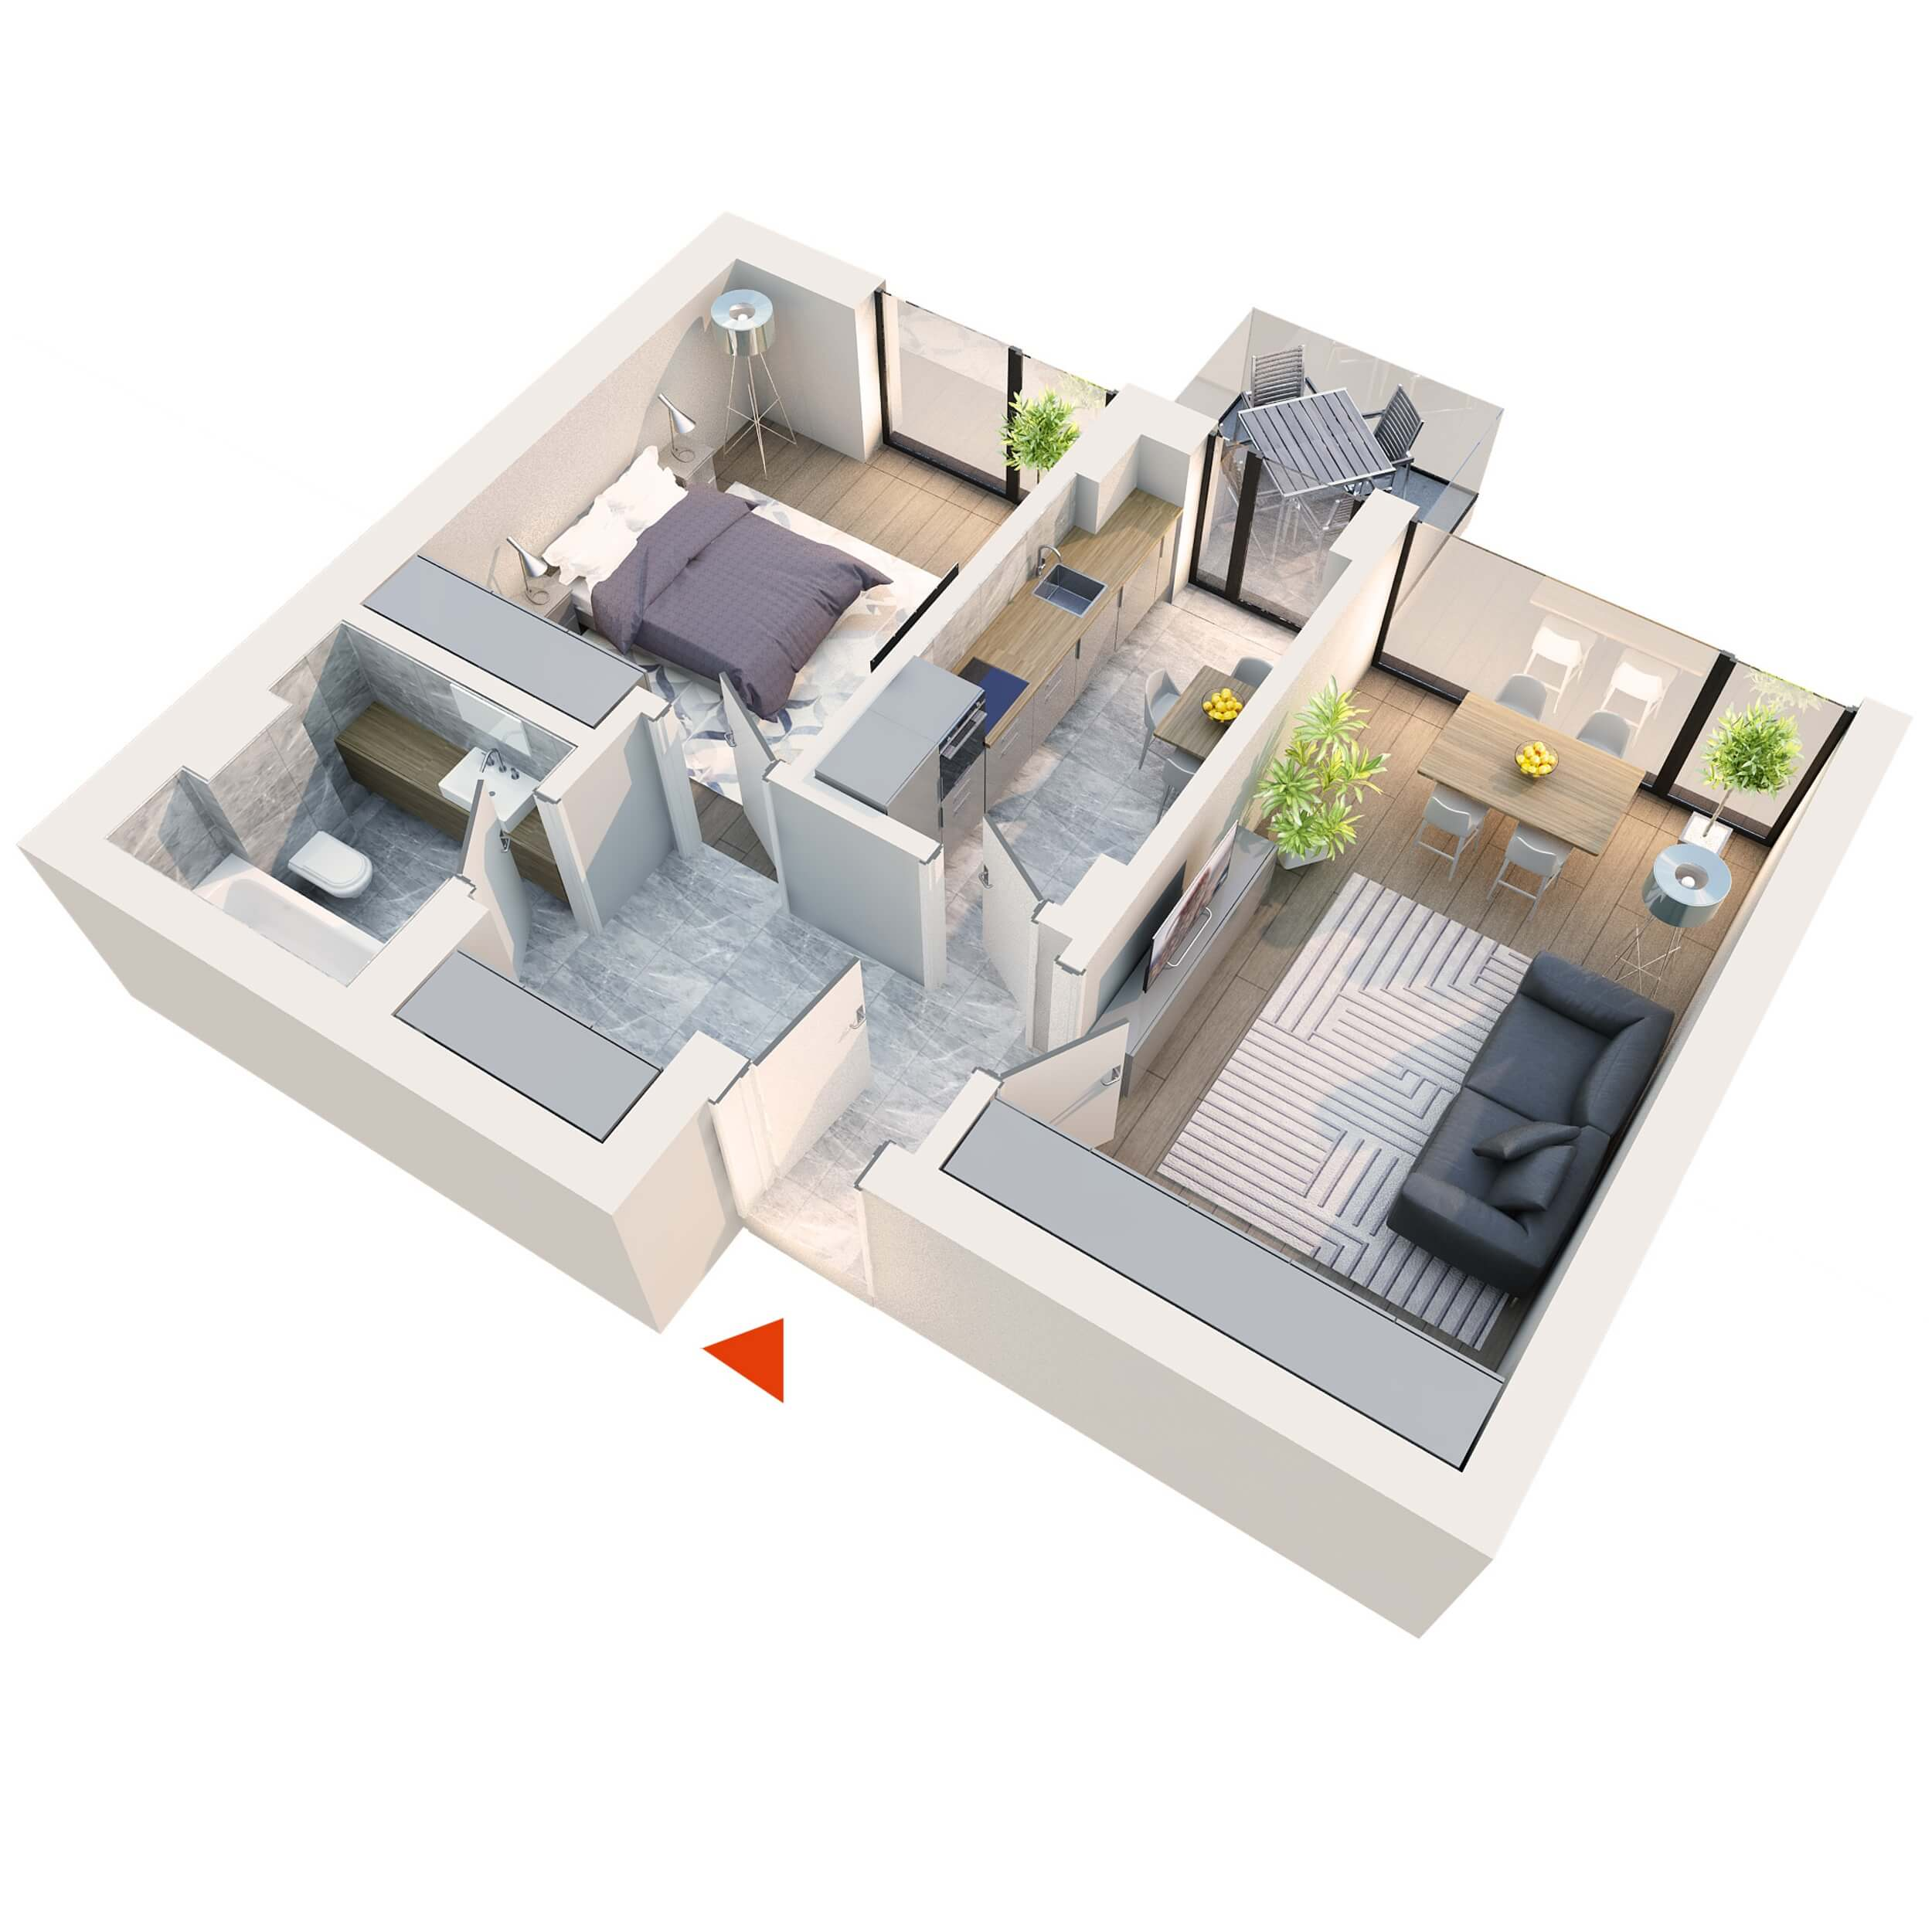 Apartament 2 camere tip 2B4′ Balcon | Etaj 1-3 | Corp C1, C6 | Faza 2